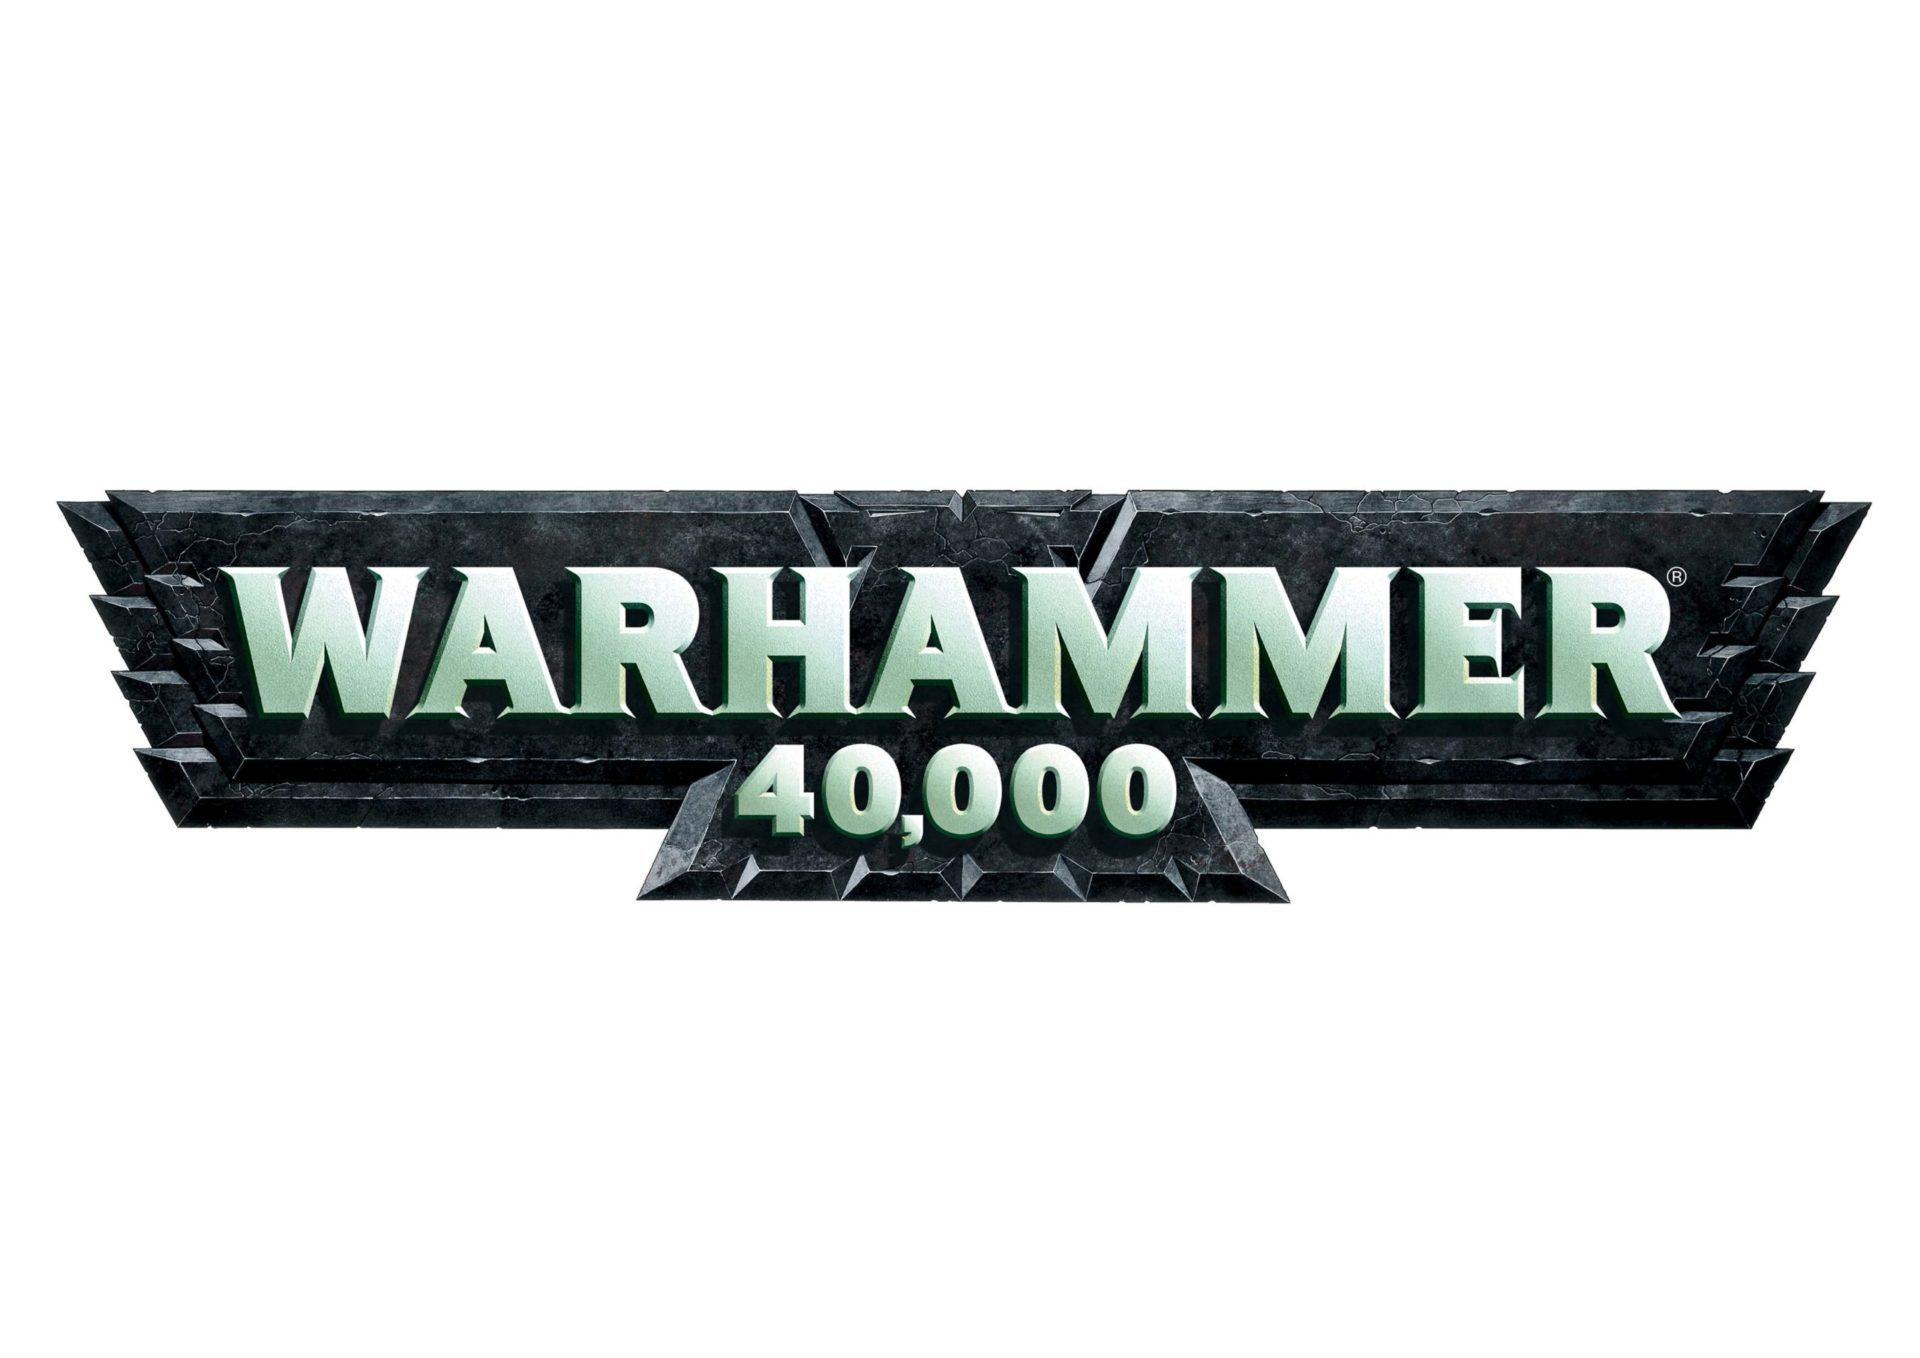 Warhammer 40.000: la serie TV targata Games Workshop in cantiere 1